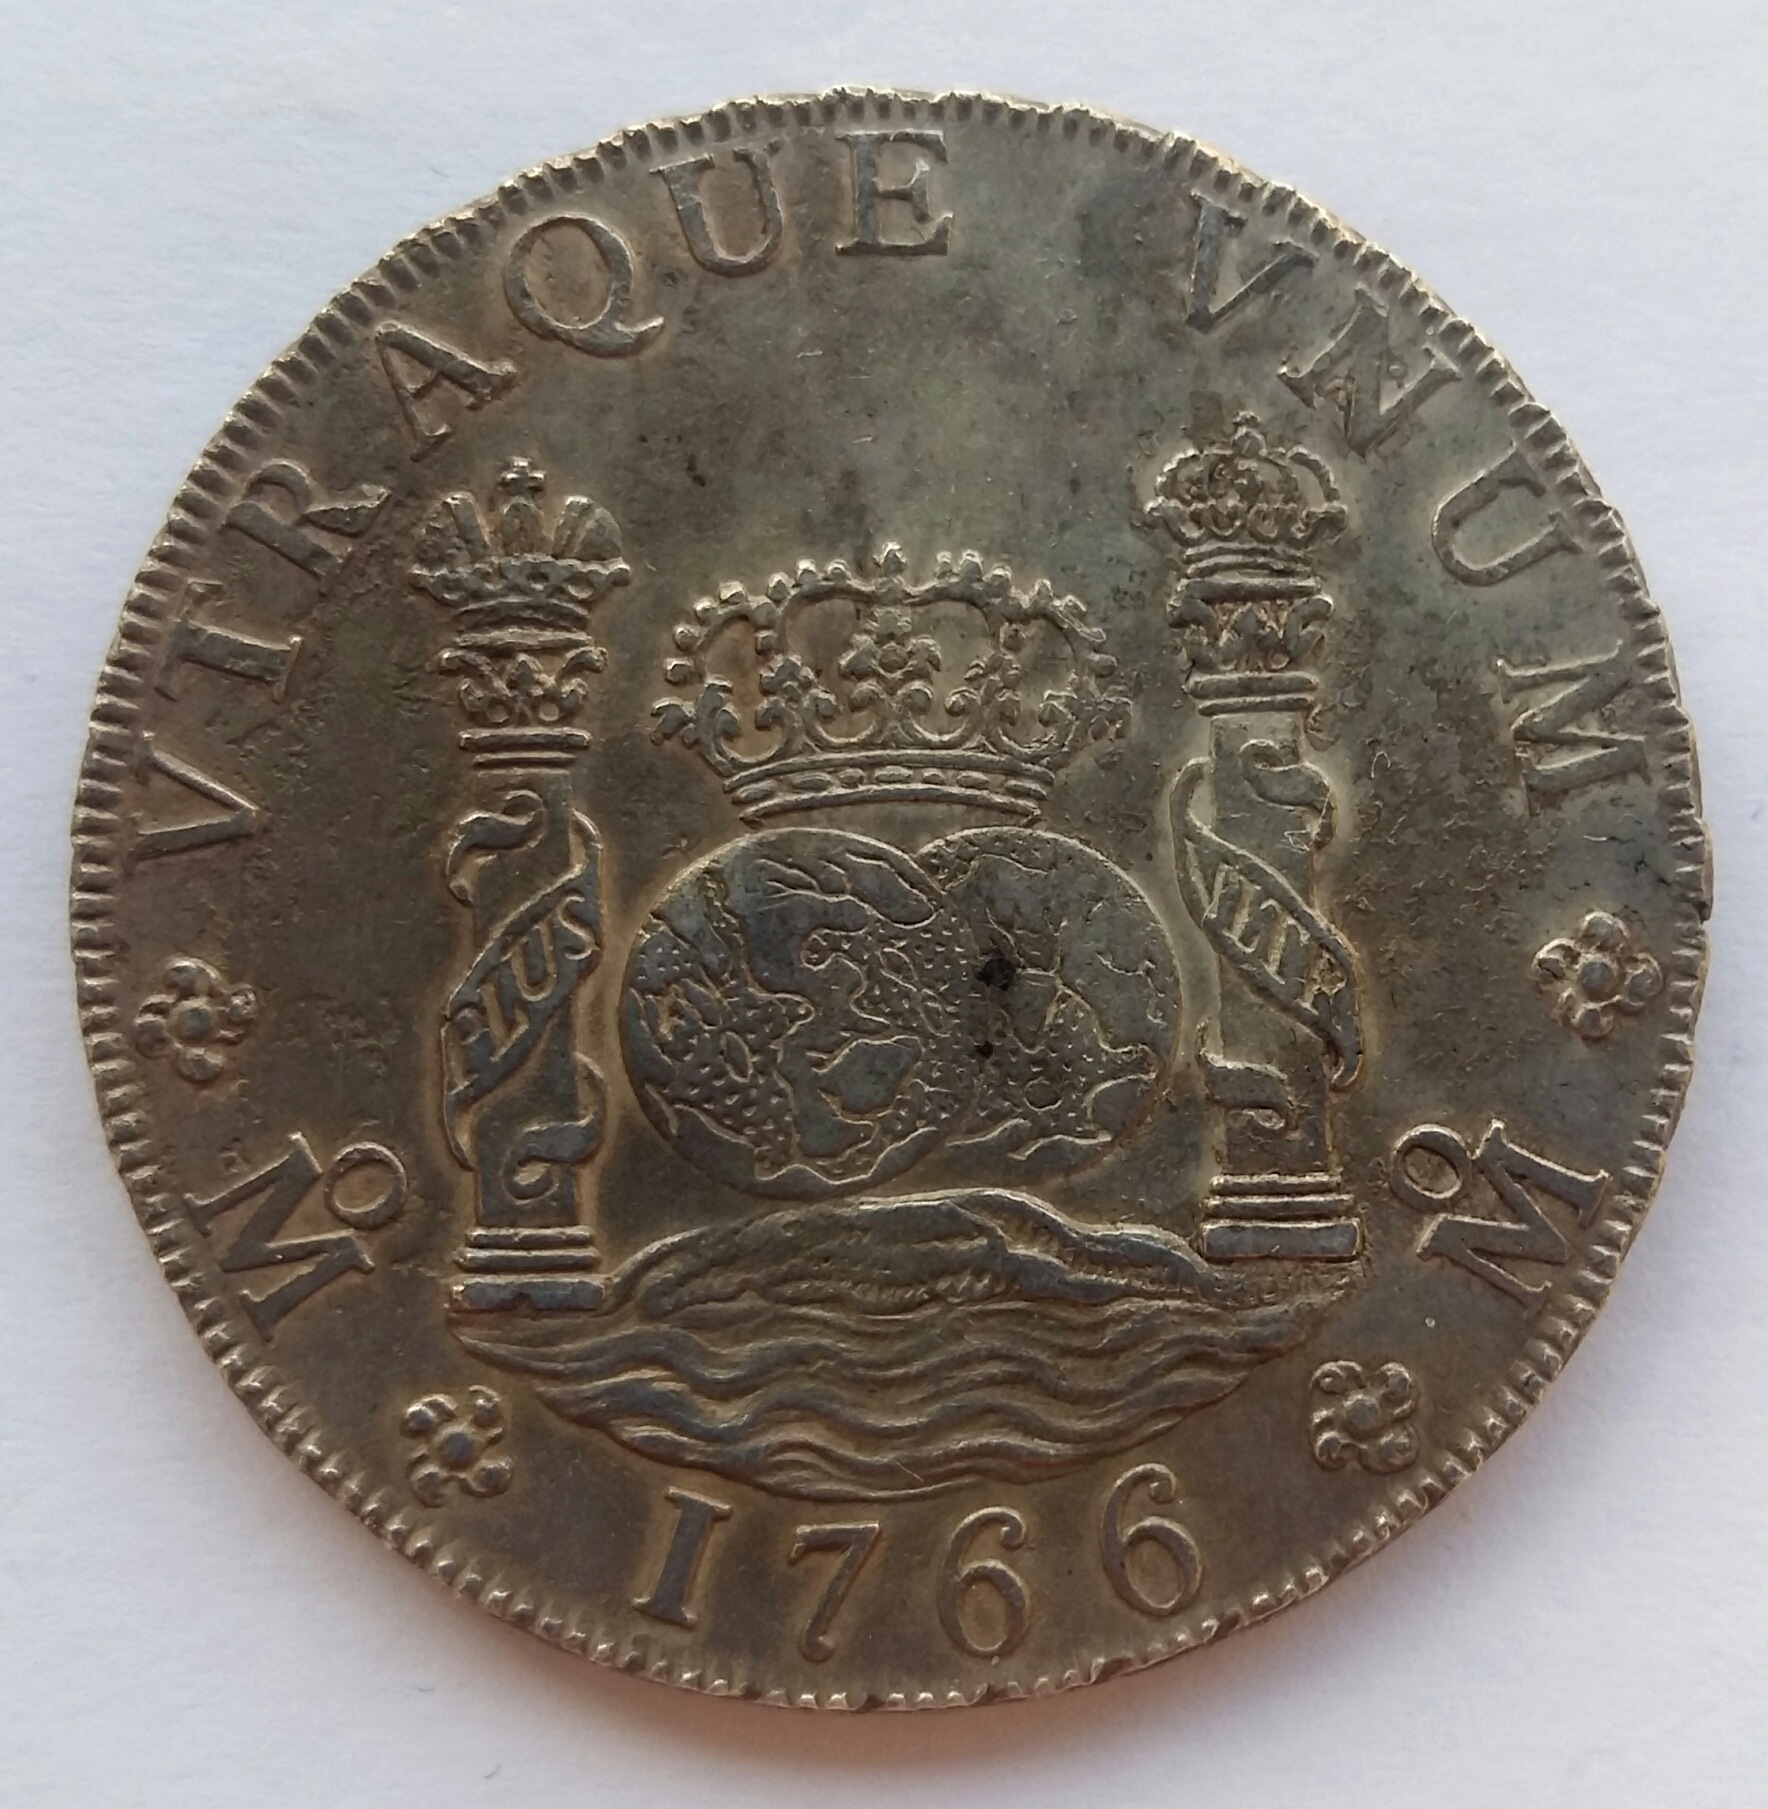 8 Reales 1766. Carlos III. Méjico MF 20200113